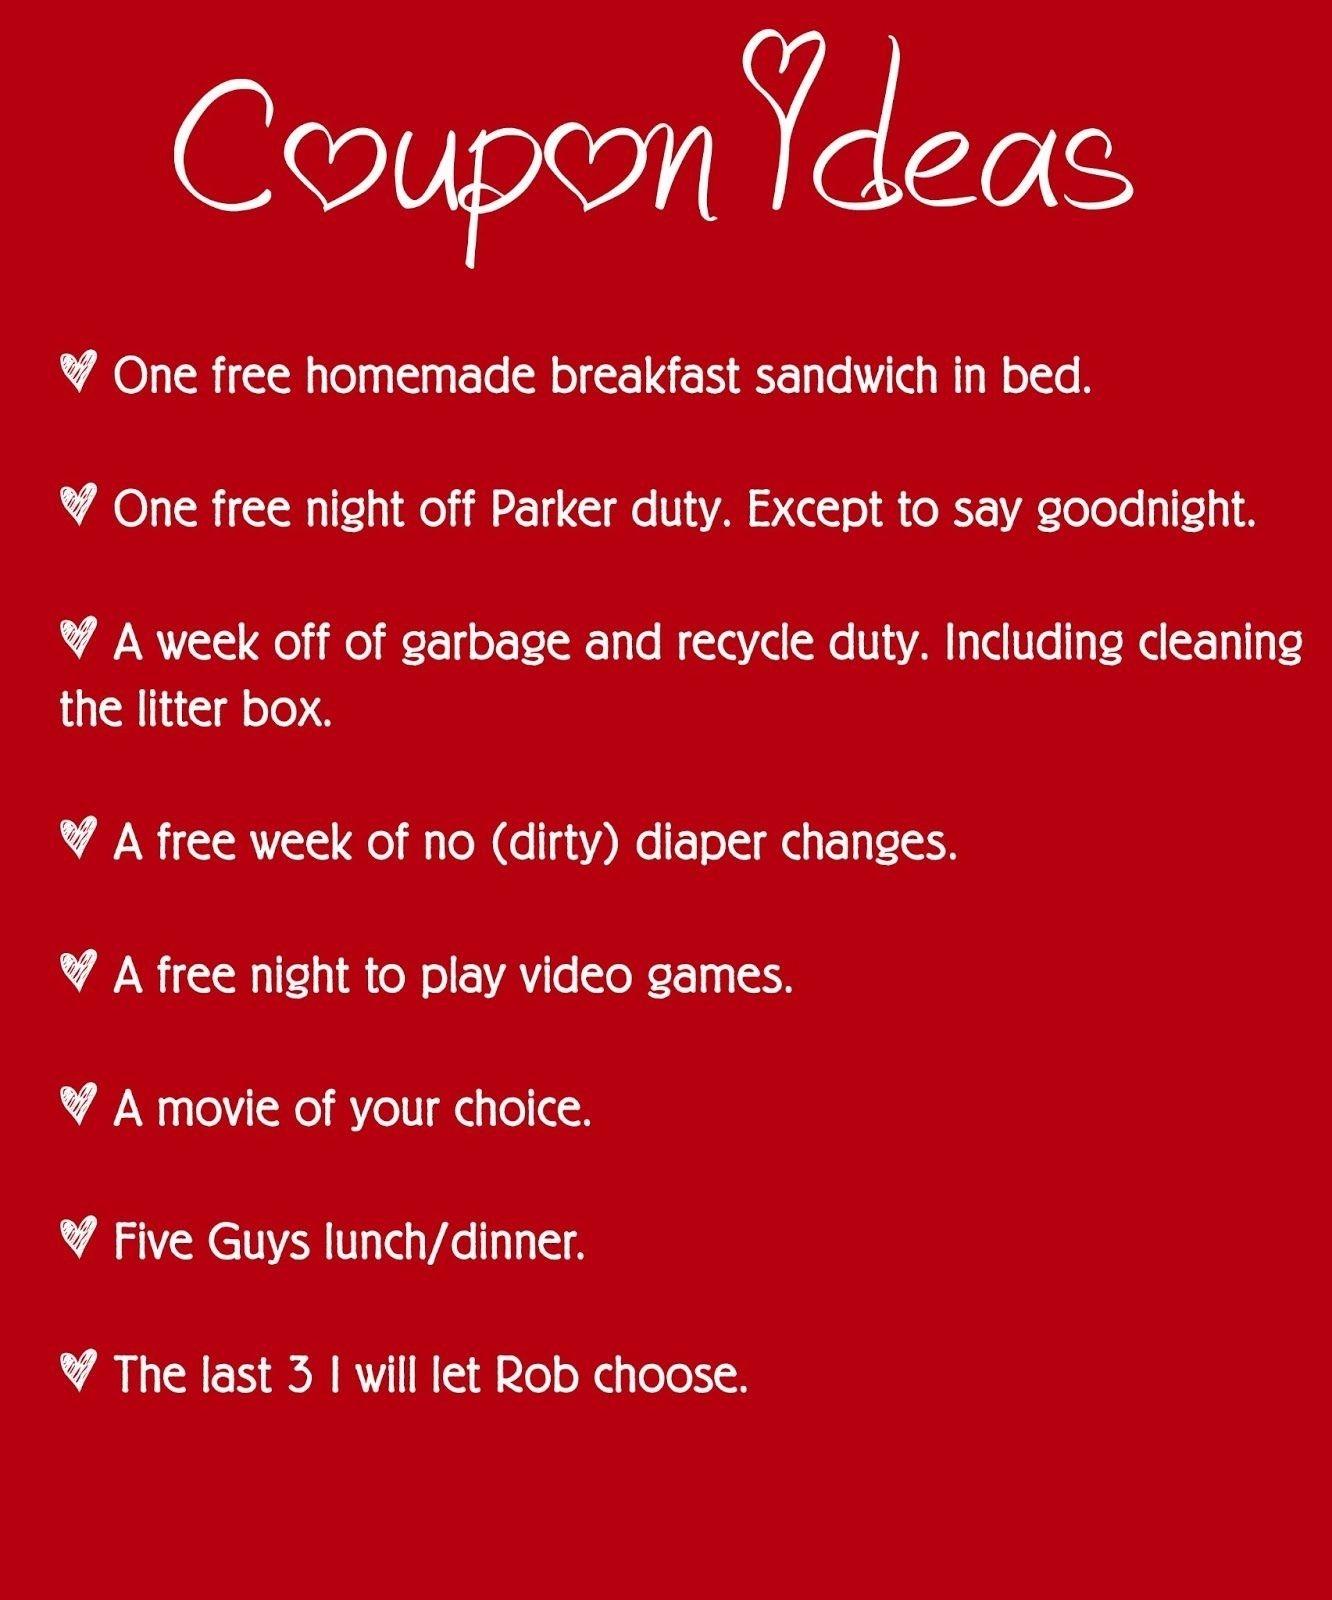 10 Stylish Cute Coupon Ideas For Boyfriend valentines day coupon book idea valentines day pinterest 1 2020